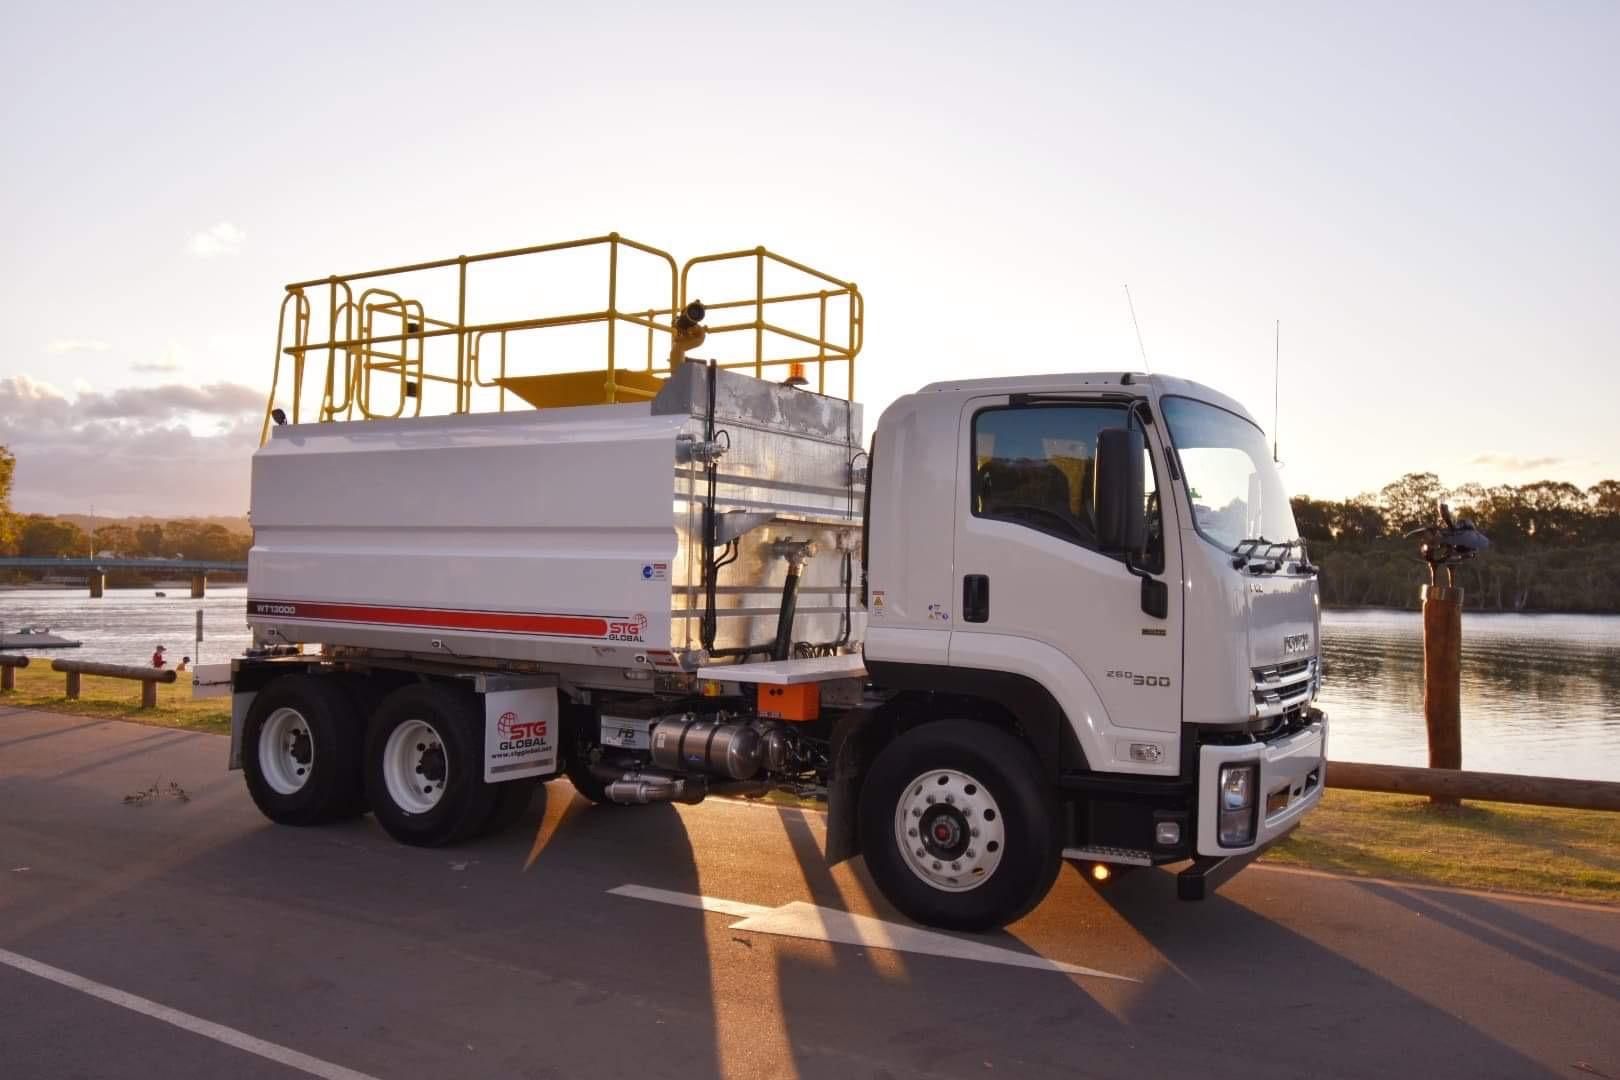 2019 Isuzu FVZ260-300 Auto 6x4 13,000Lt Water Truck for sale